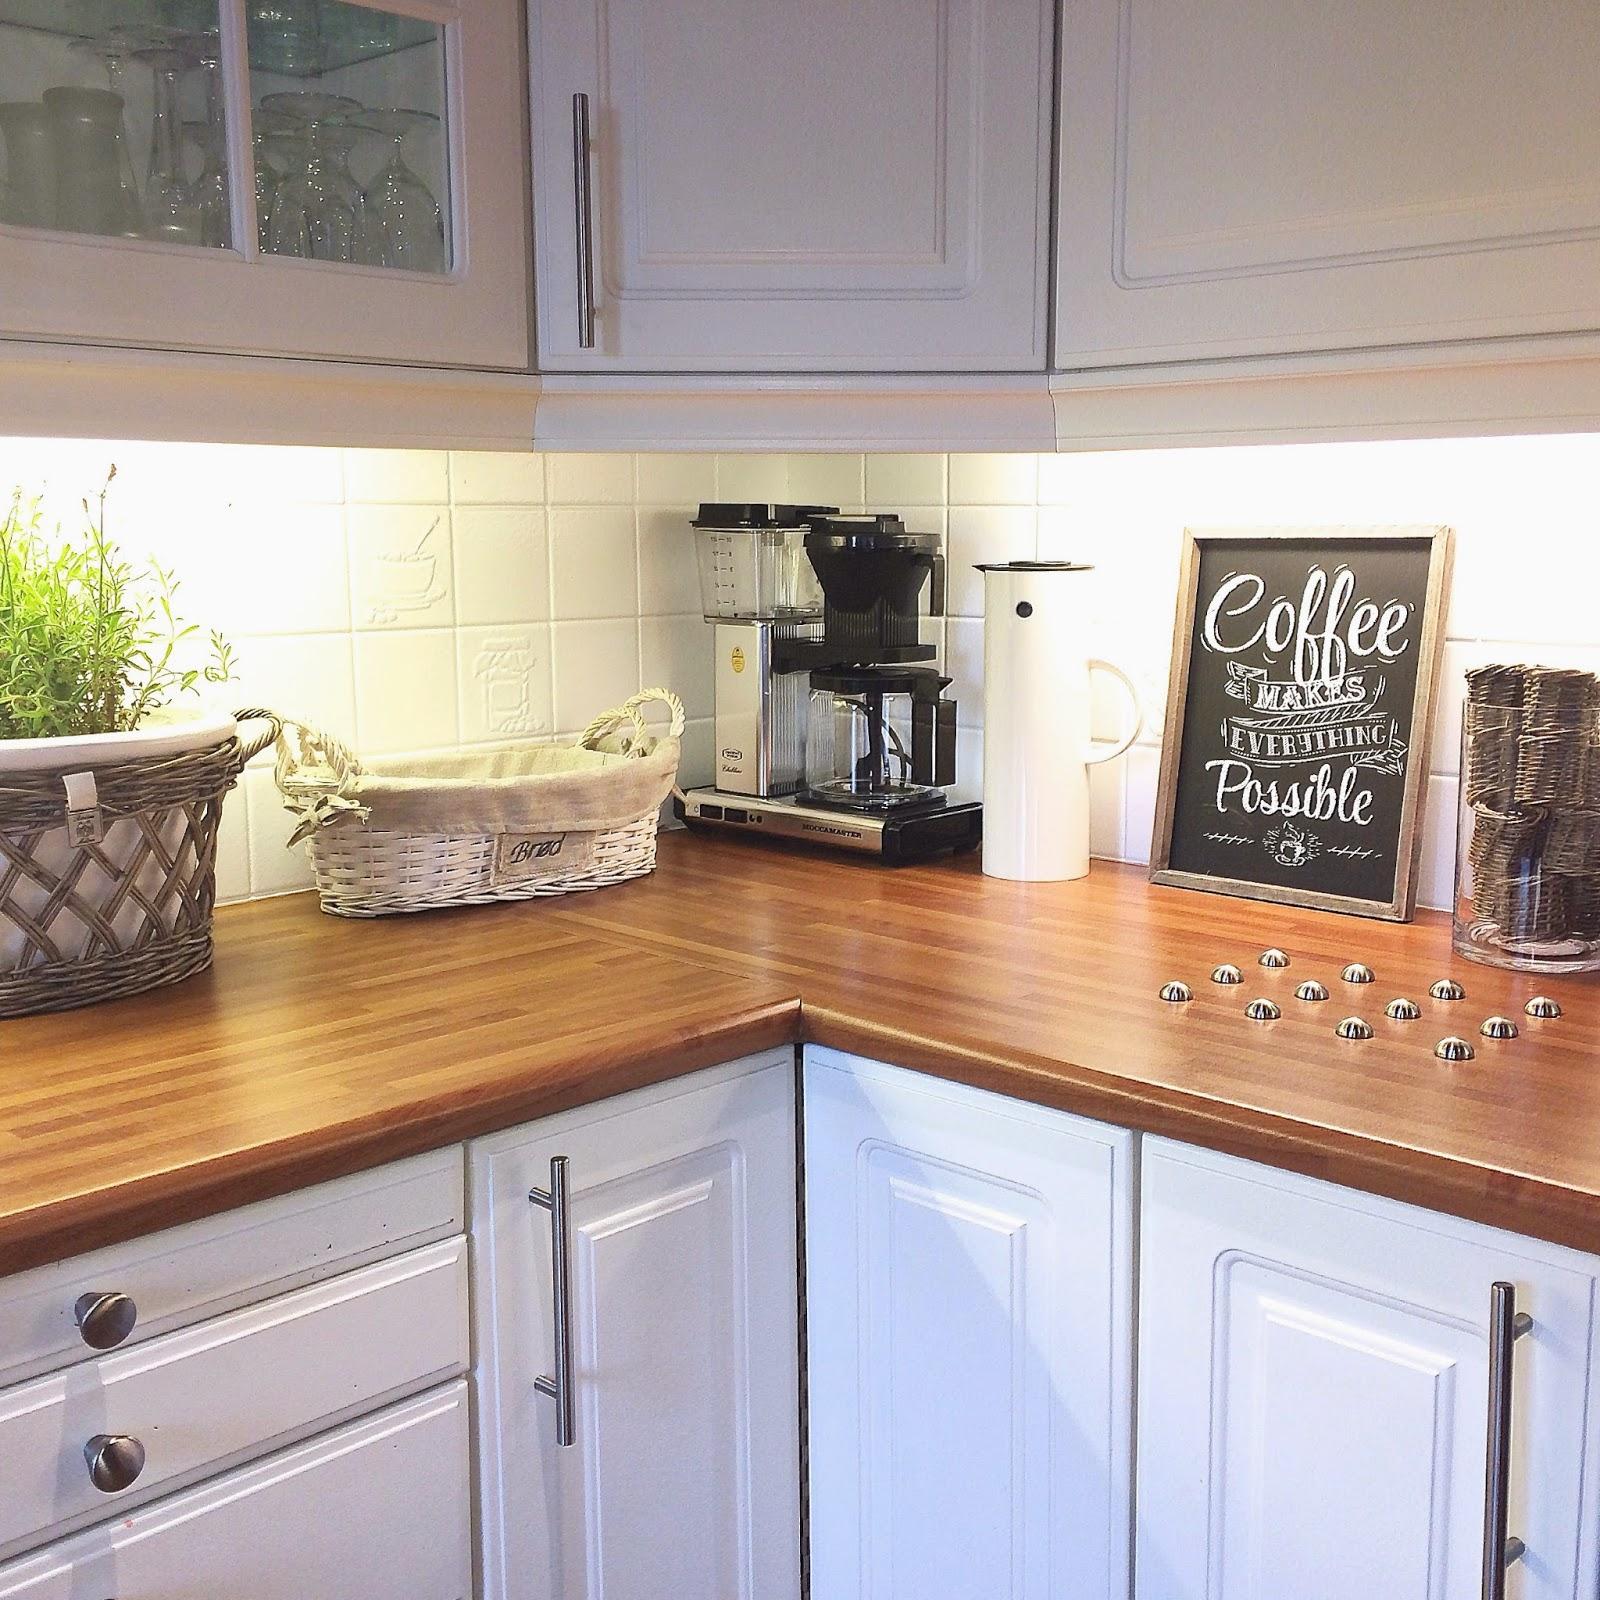 ... maison, rmnorge, maling, fliser, kj?kken, kitchen, coffee, oppussing